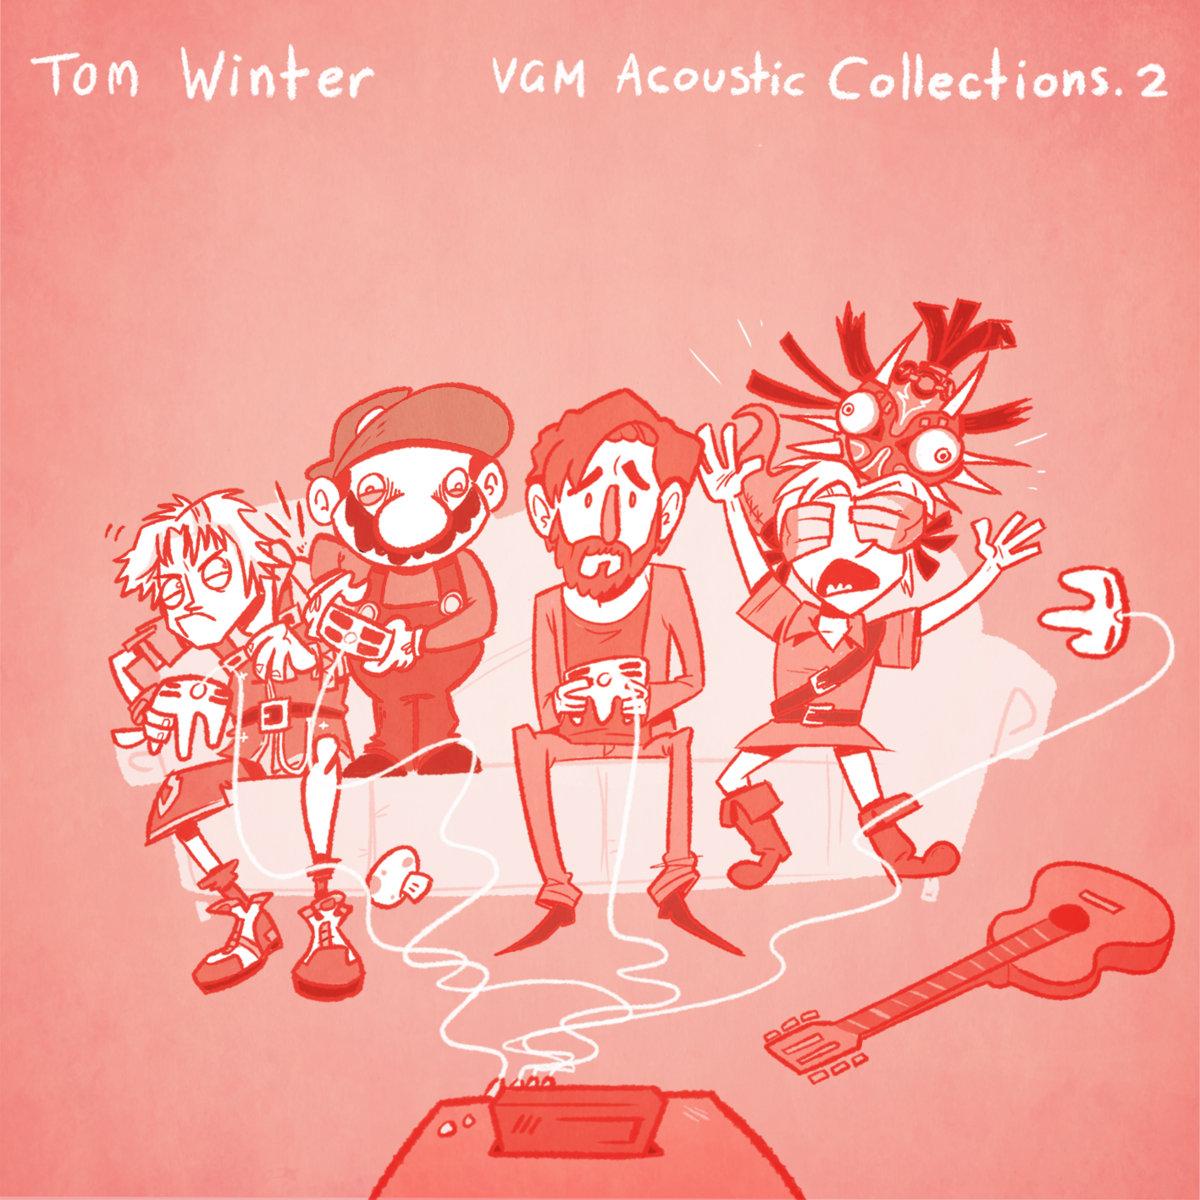 Super Mario 64 - Dire Dire Docks | Tom Winter